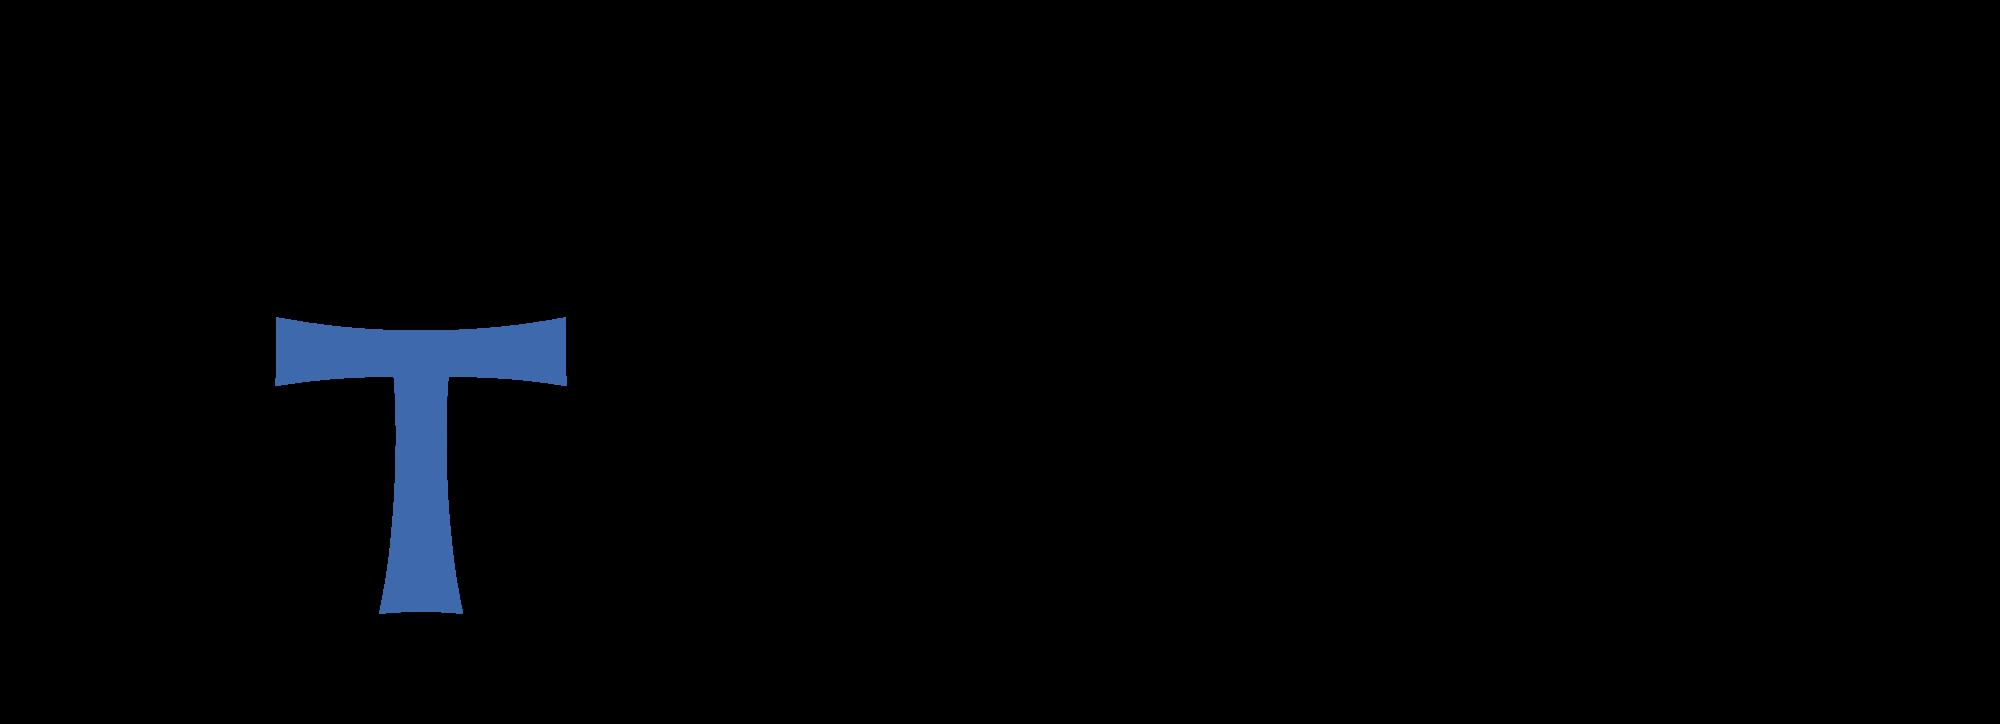 2000px-JLU_Giessen-Logo.svg